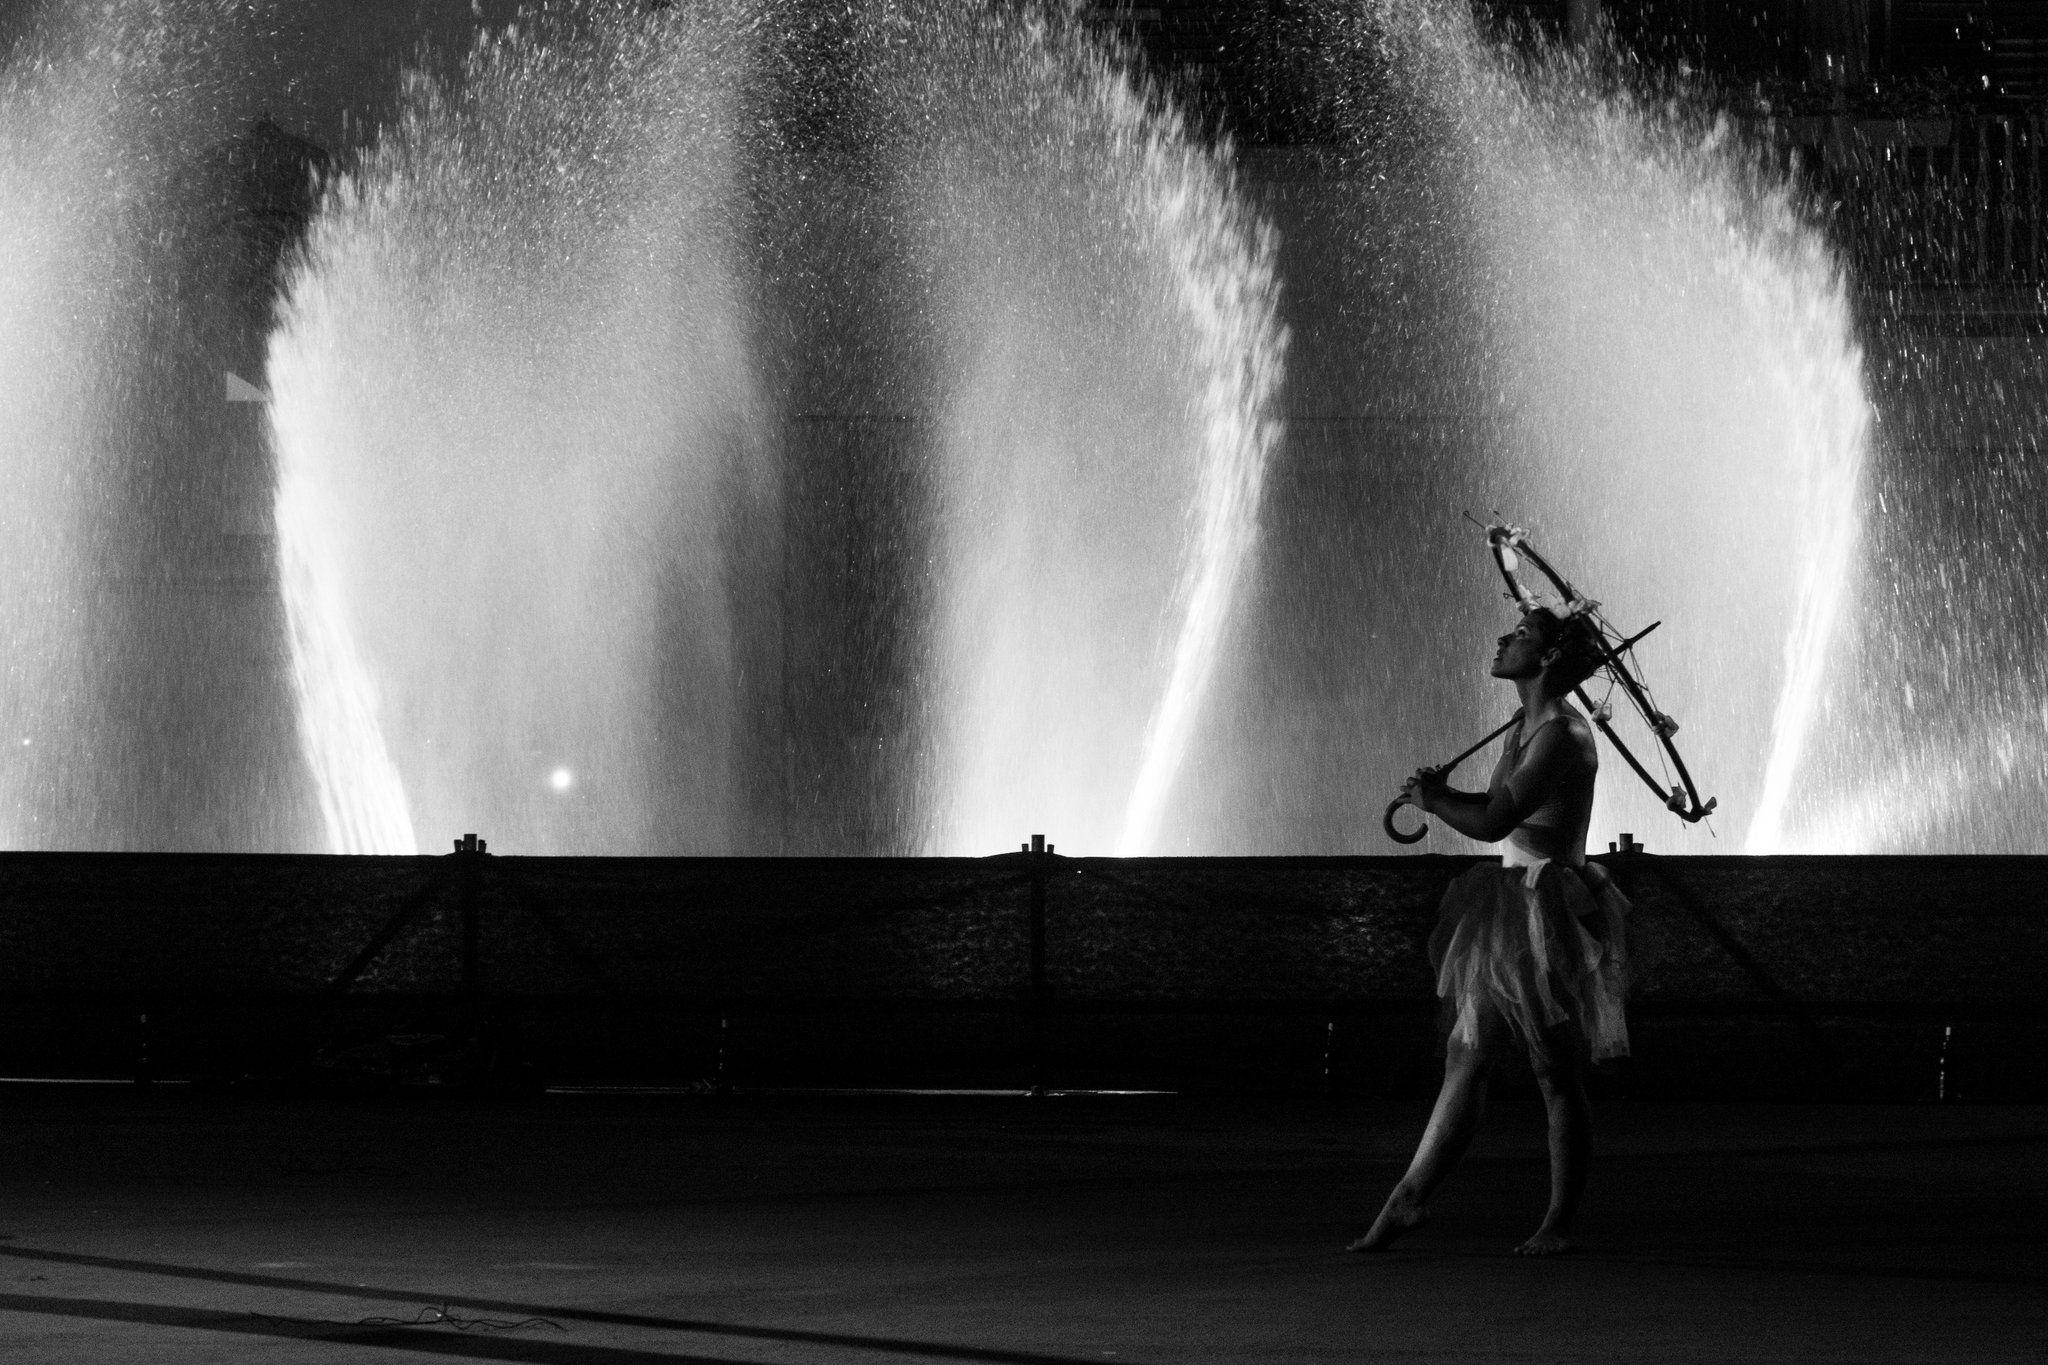 Foto scattata da Francesco Nigi con α6300.                            Pagina Facebook: https://www.facebook.com/FrancescoNigiPhotographer